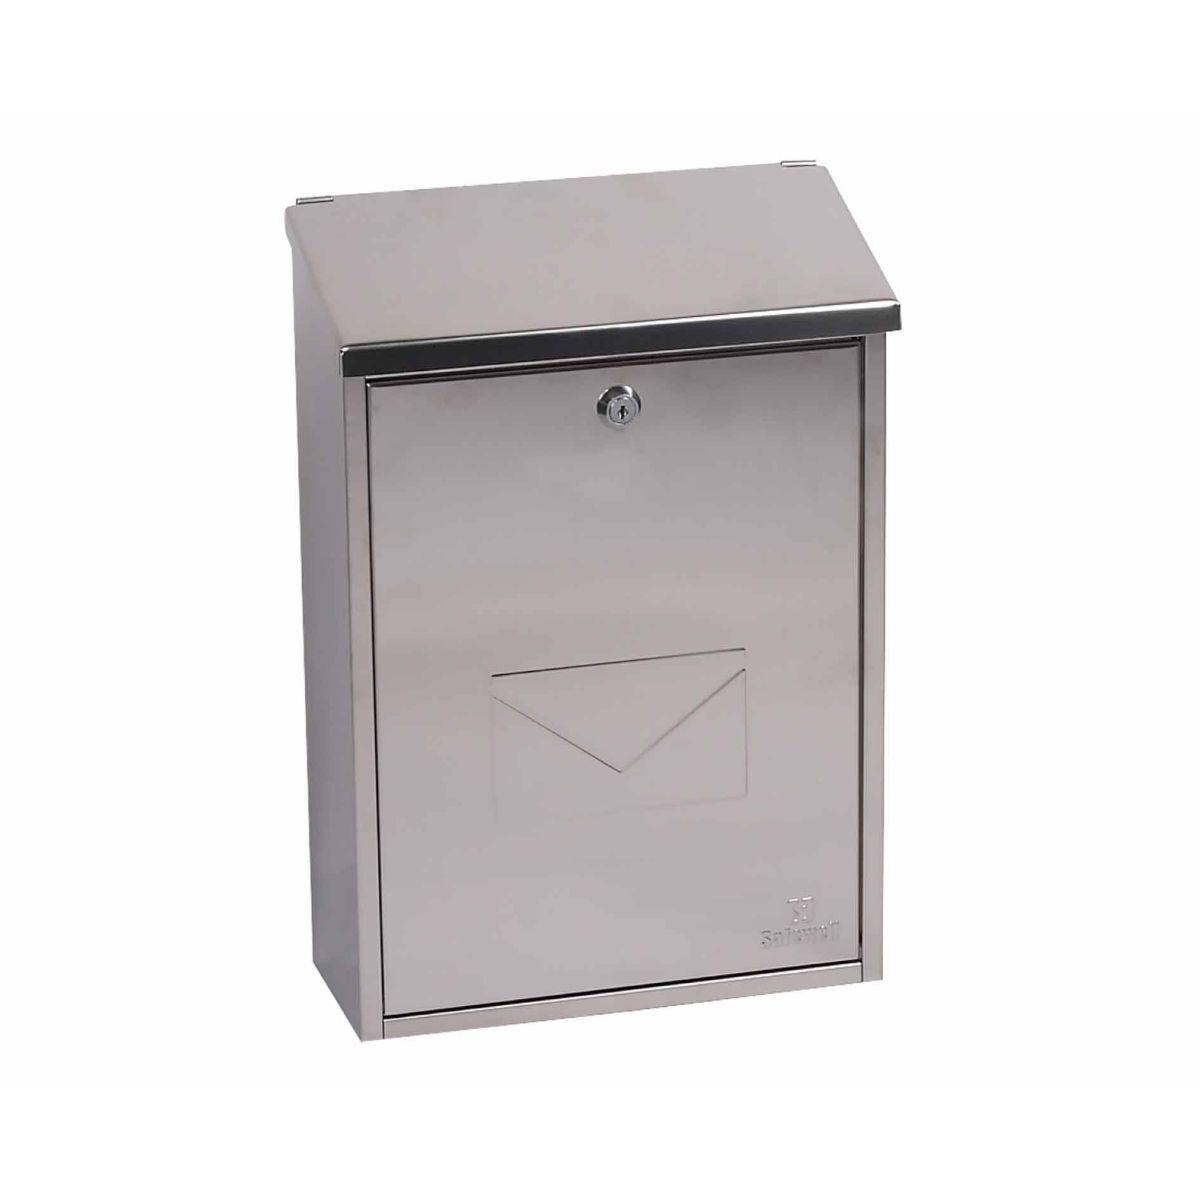 Phoenix Casa MB0111KS Top Loading Mailbox Stainless Steel